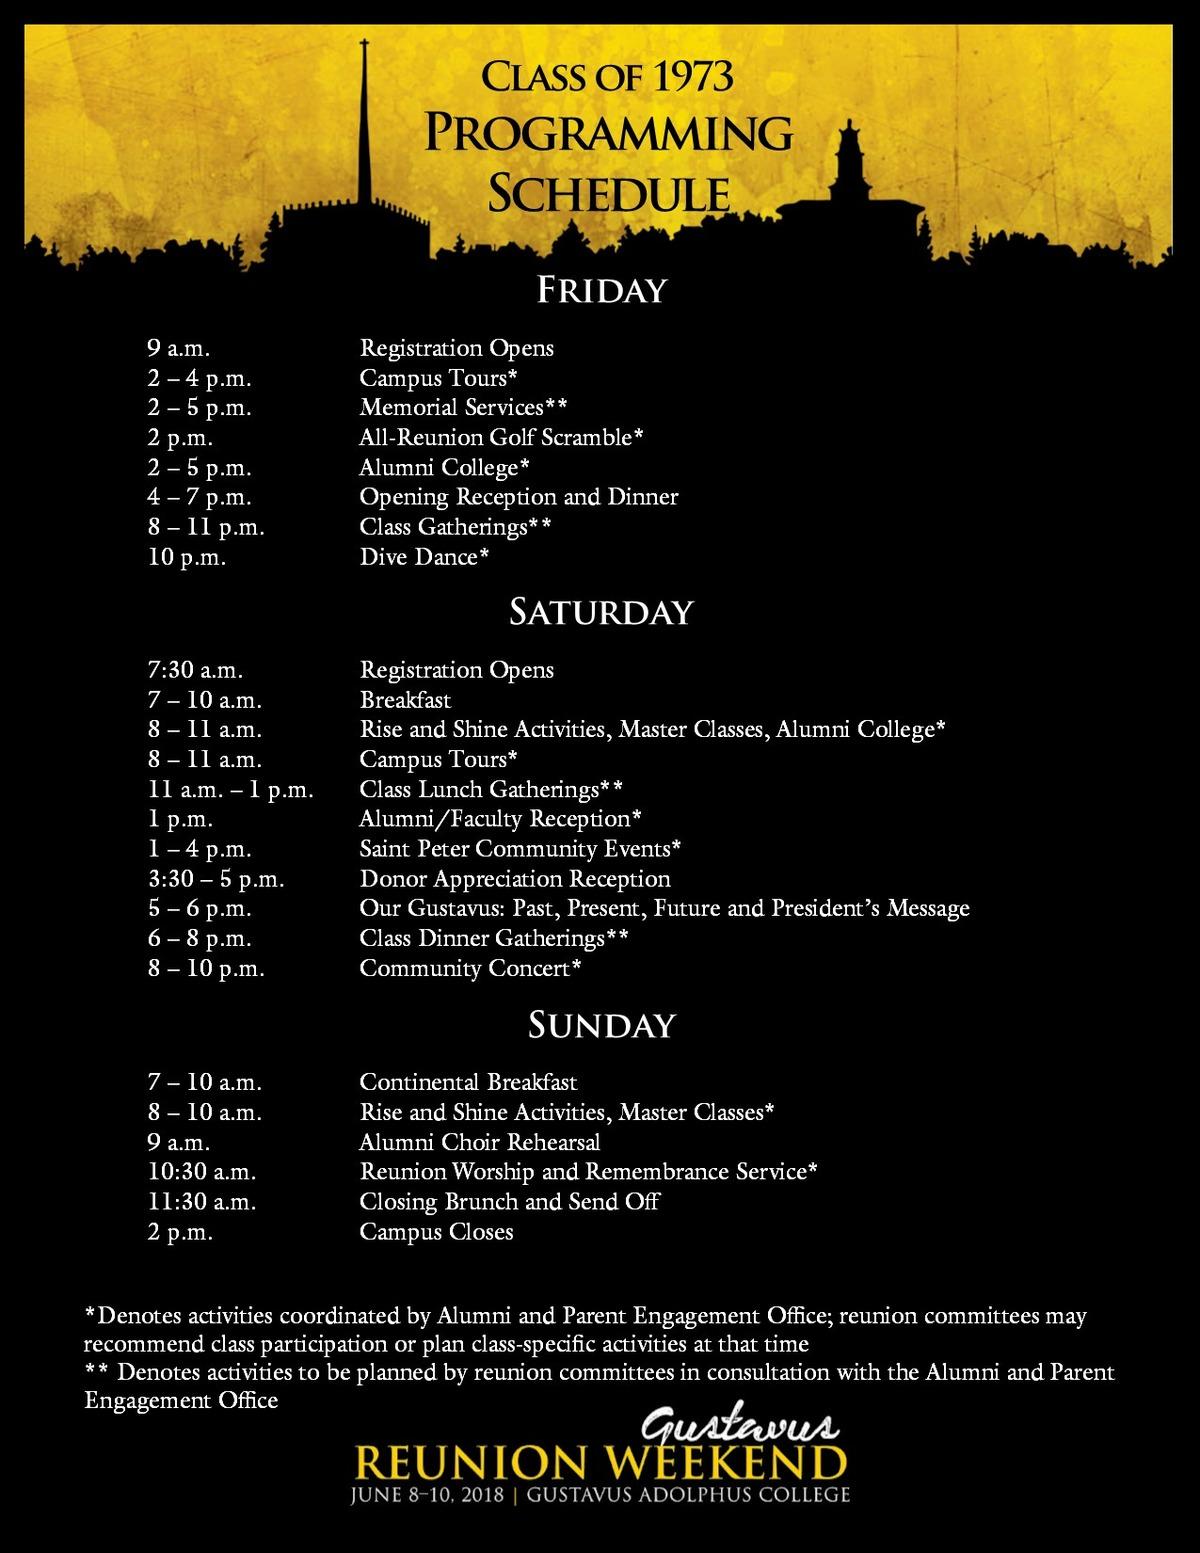 Class specific Reunion Weekend schedule